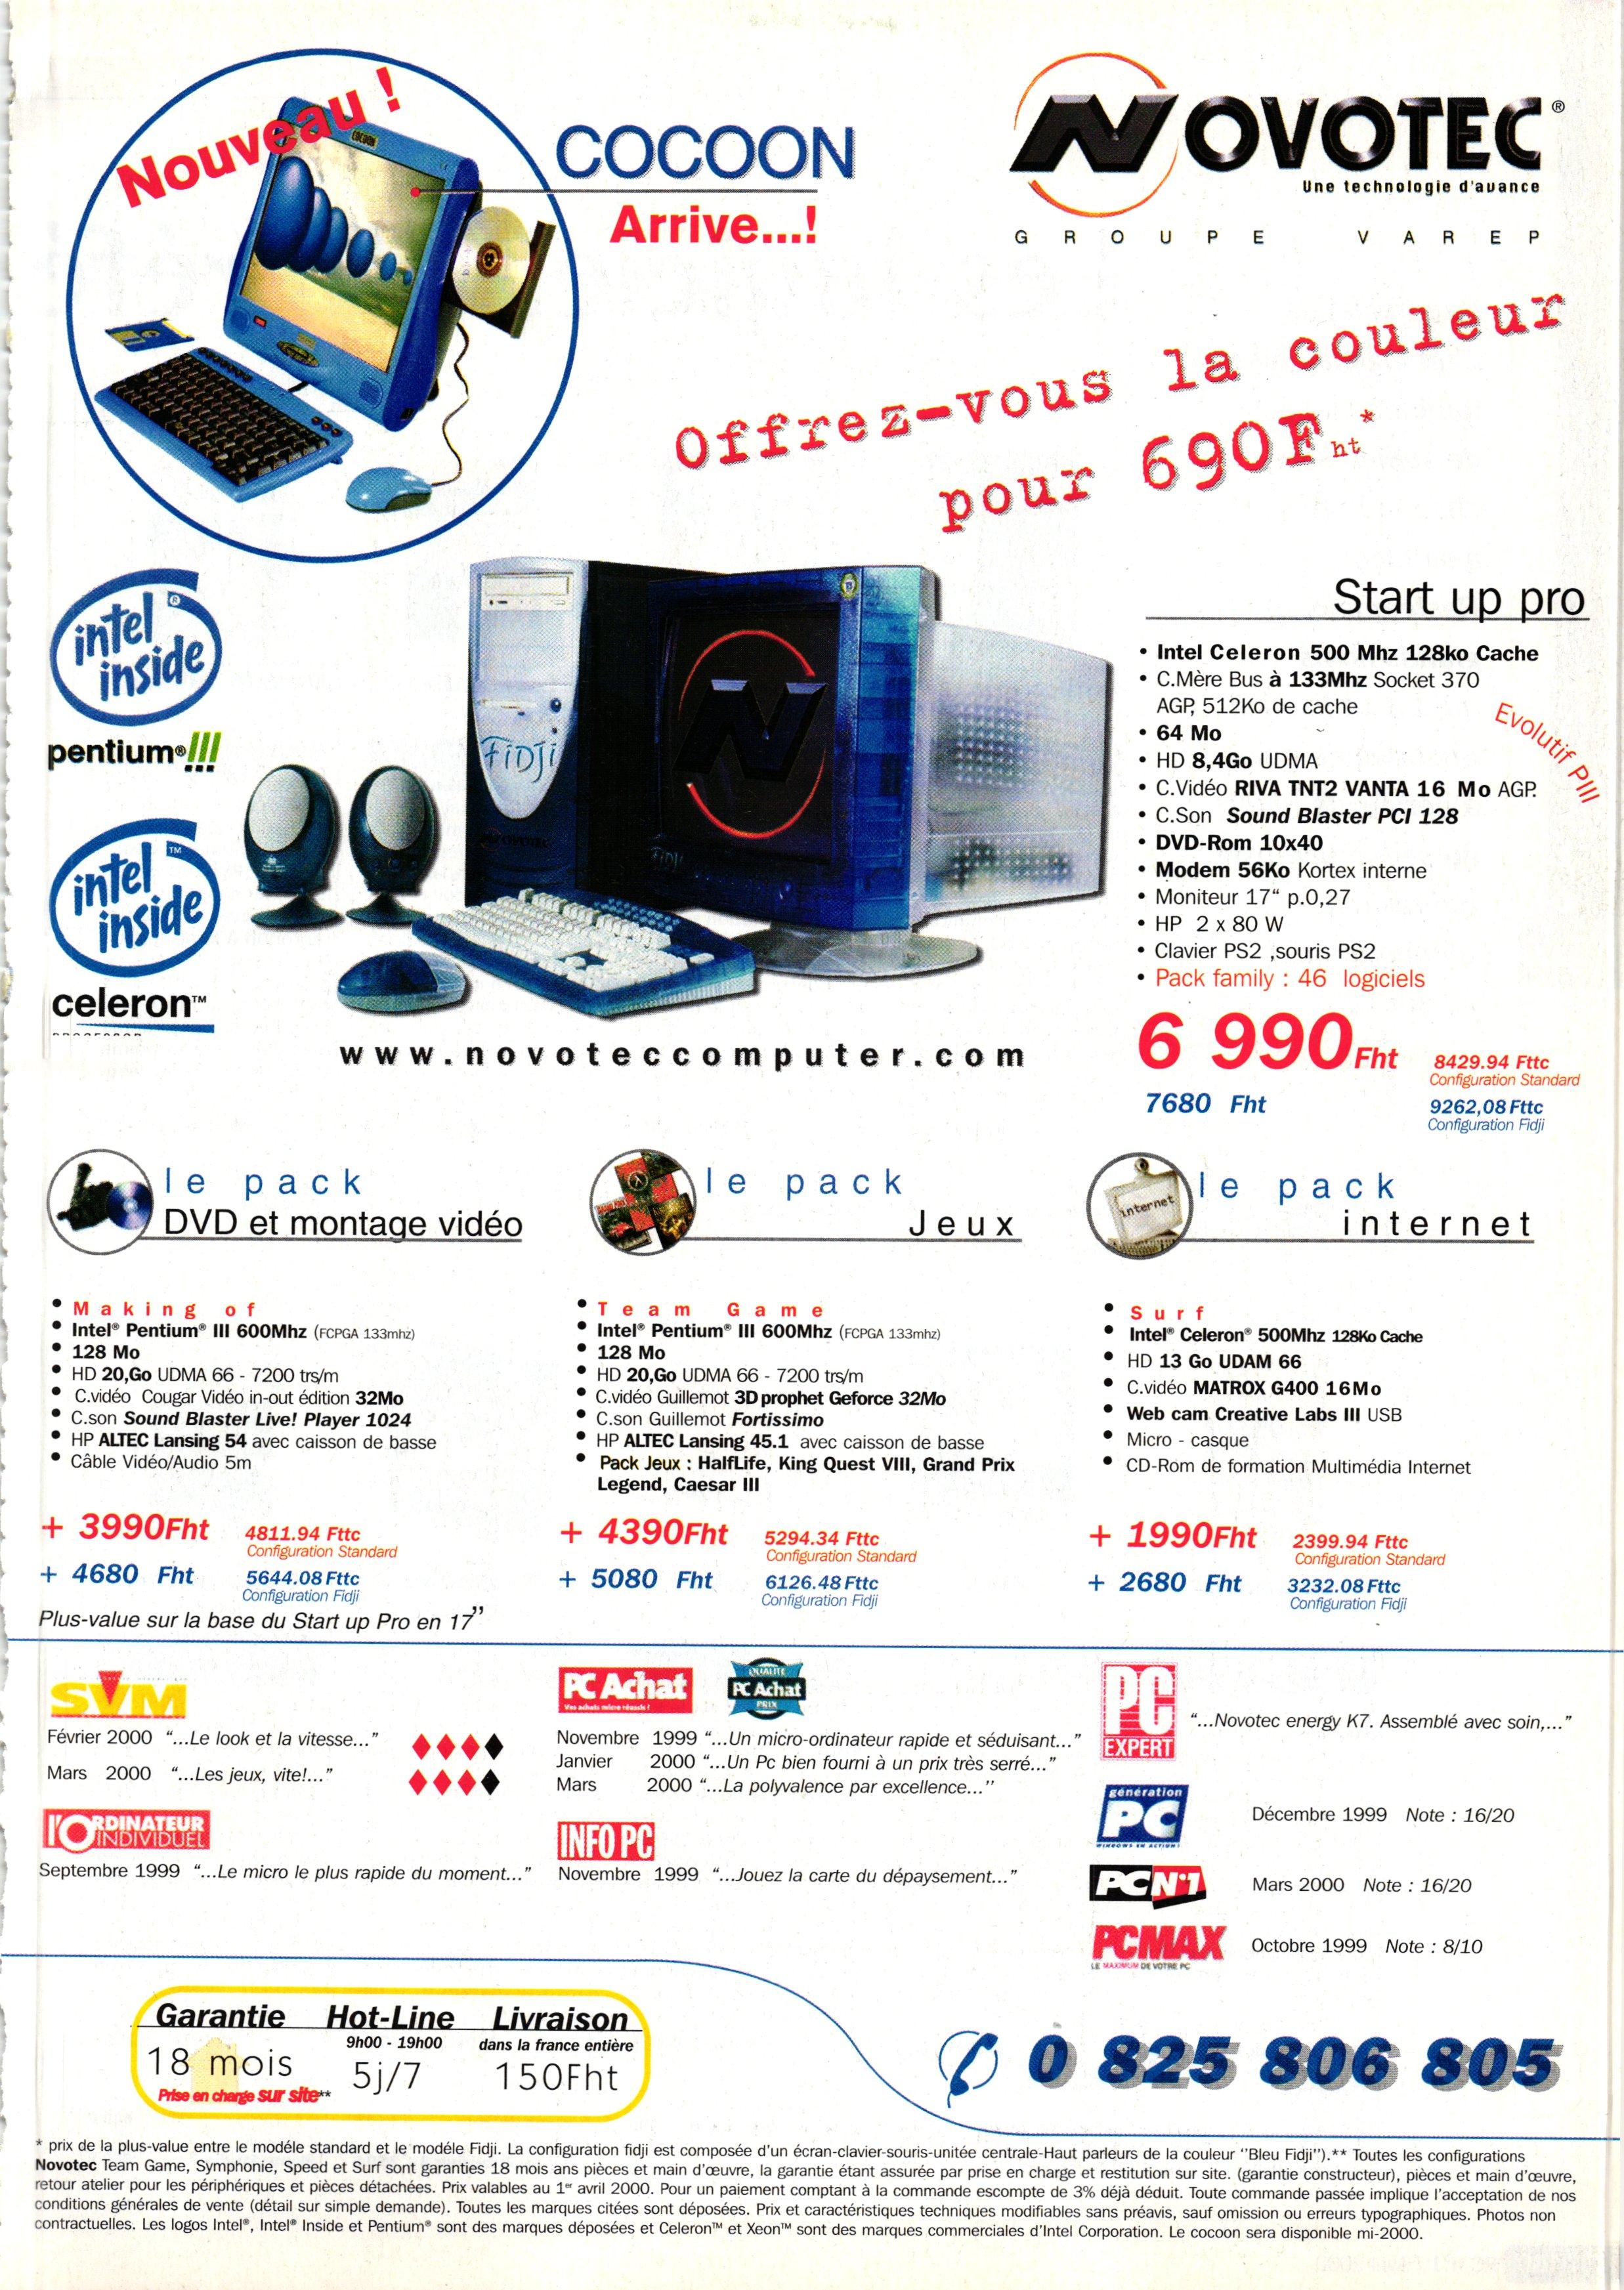 http://download.abandonware.org/magazines/PC%20N1/pcn1_numero04/p_099.jpg